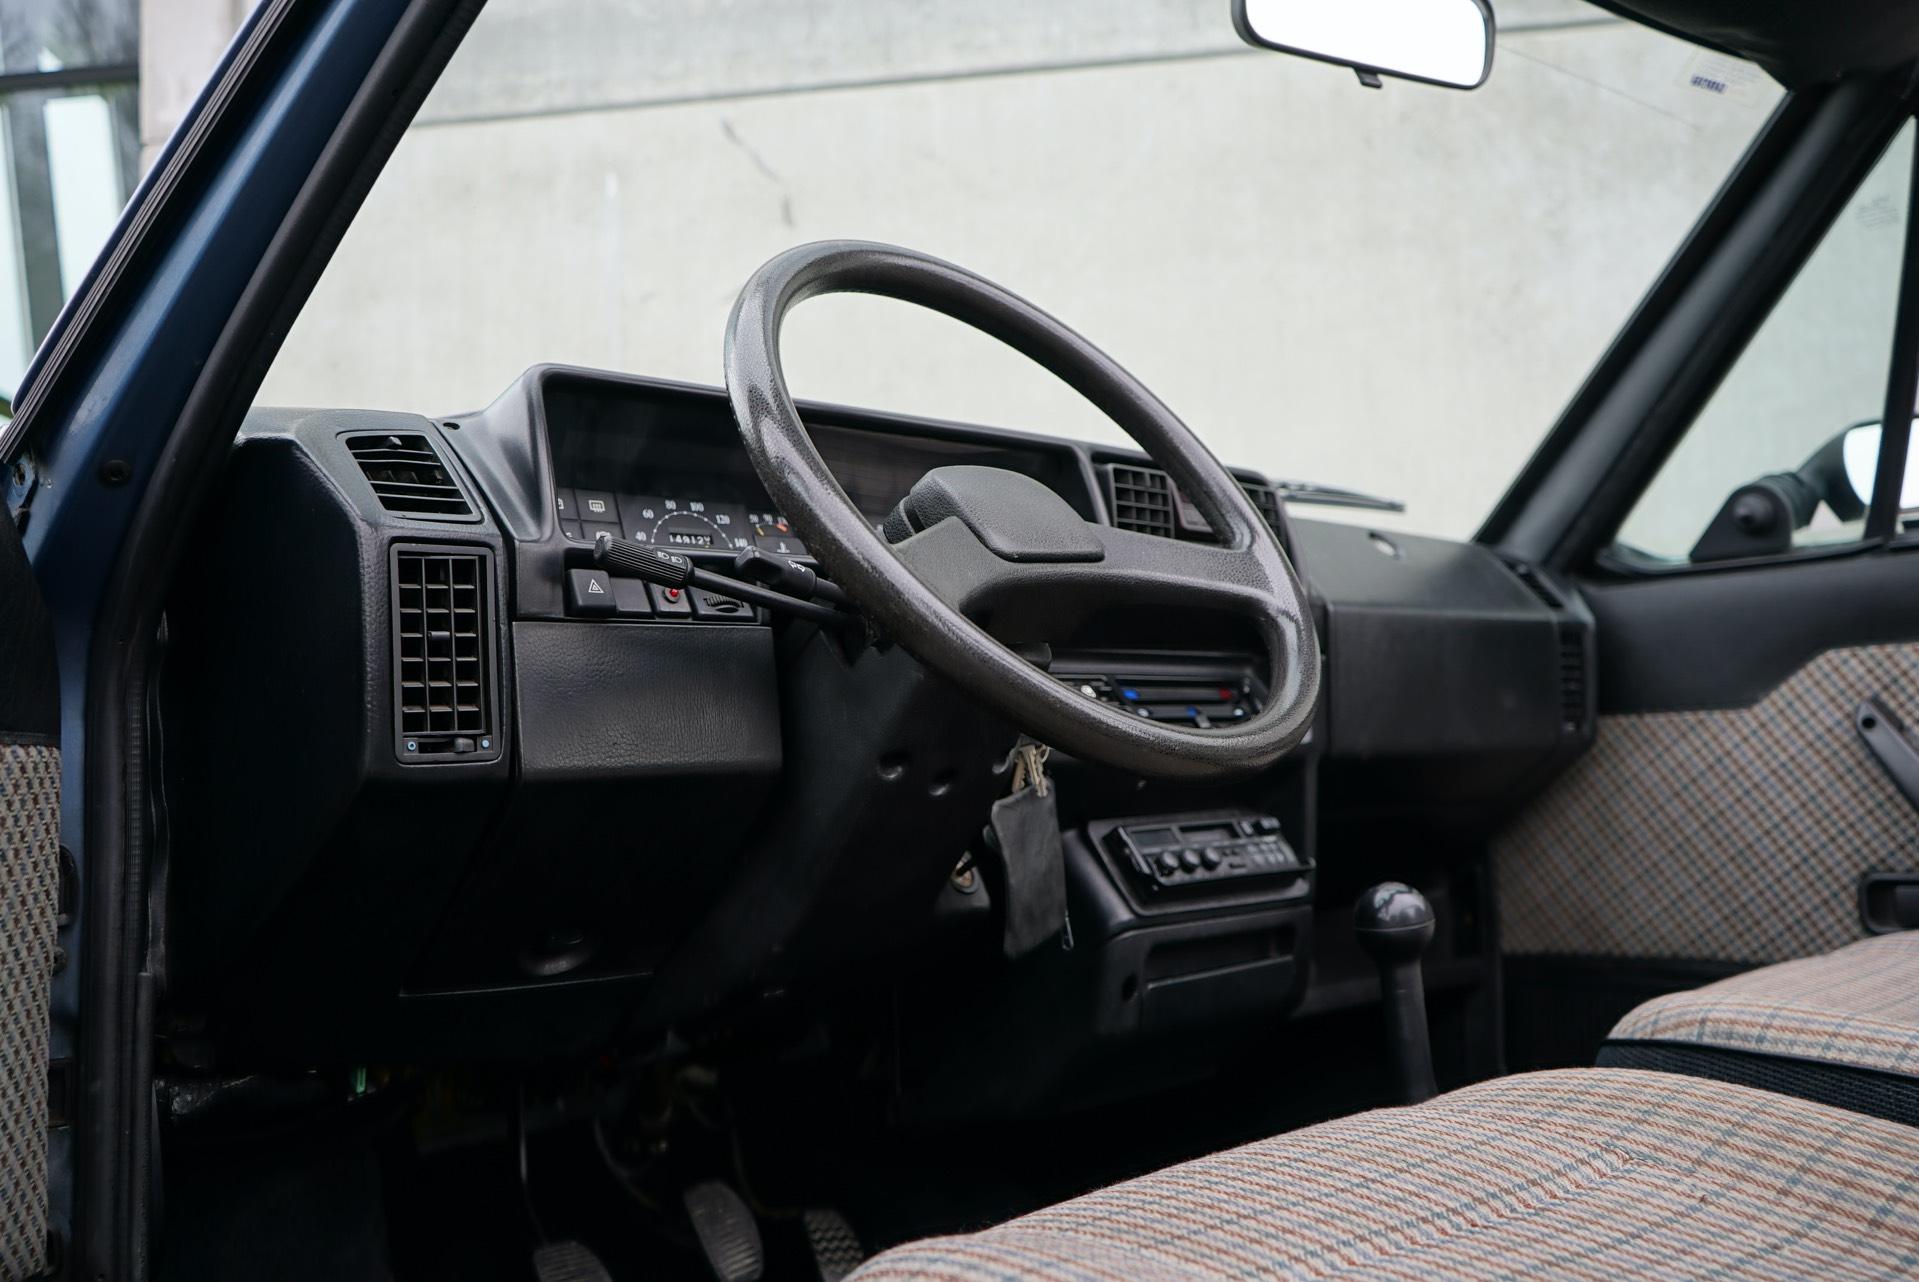 FIAT RITMO 85 CABRIOLET